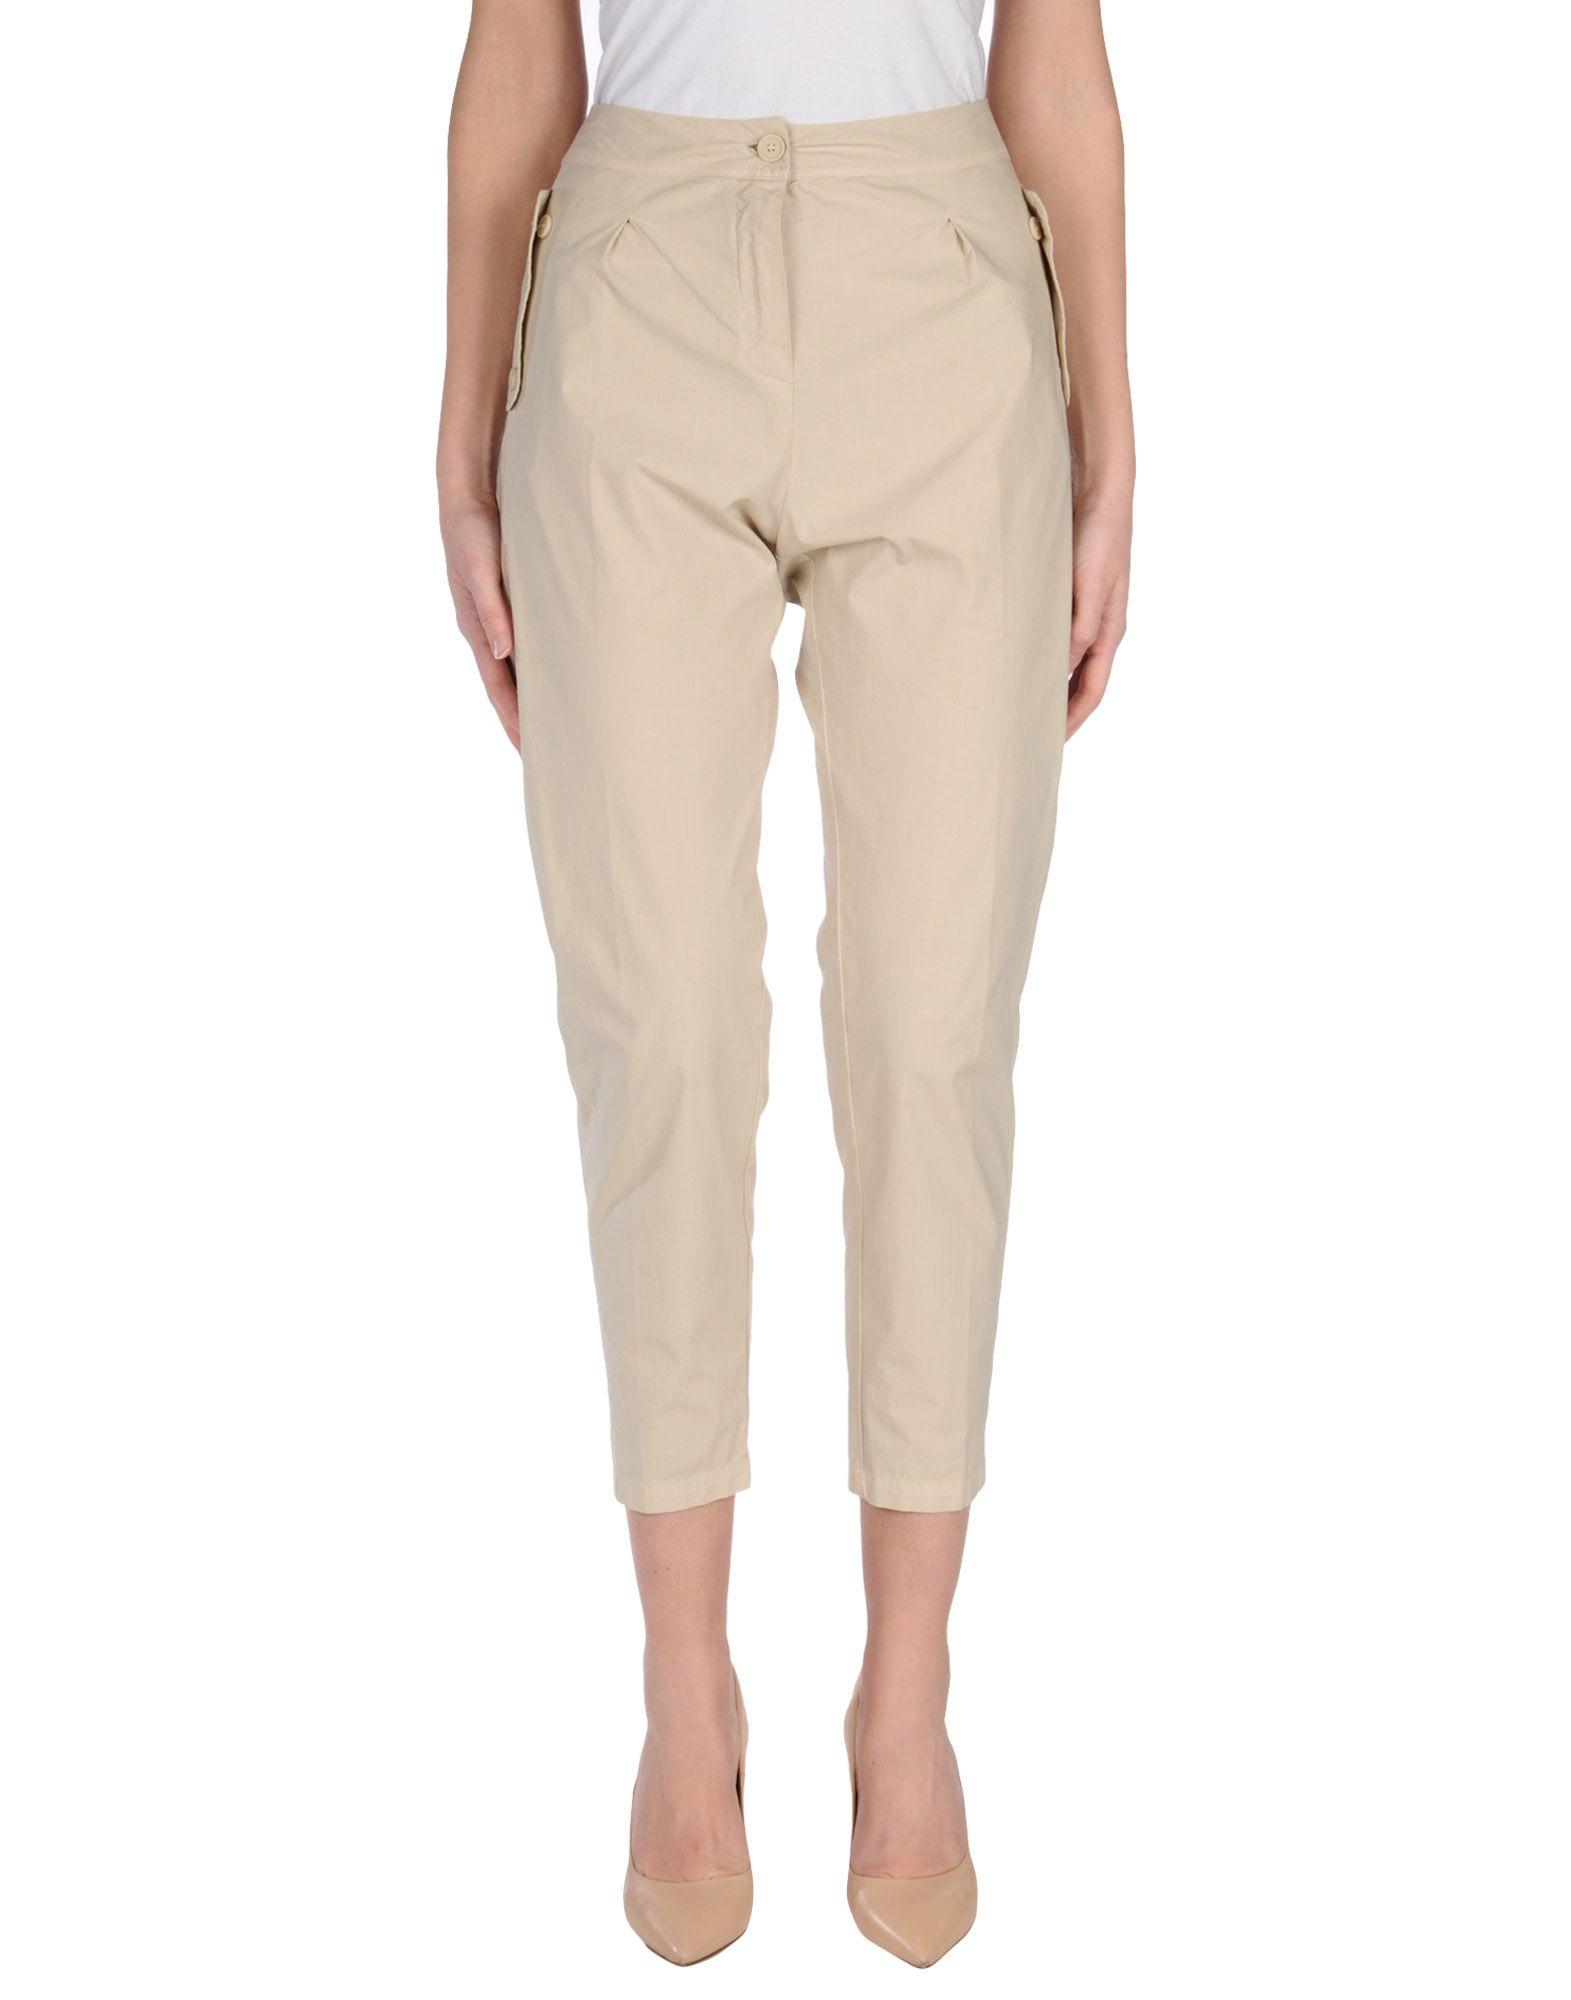 ANIYE BY Damen Hose Farbe Beige Größe 6